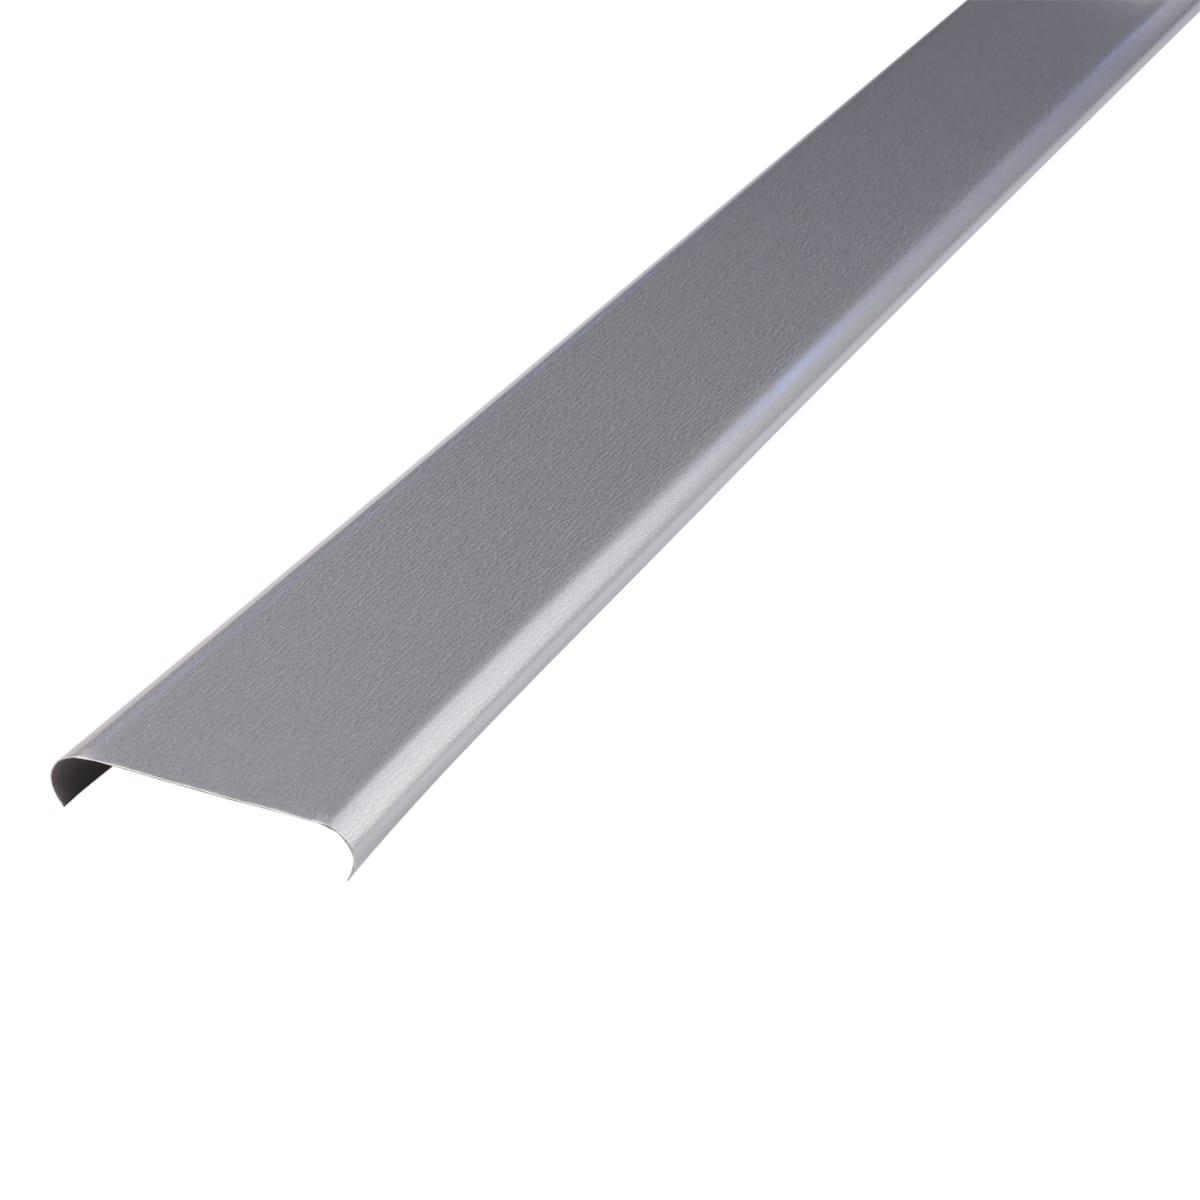 Набор реек 2.5х1 м цвет серебристый металлик, без раскладки